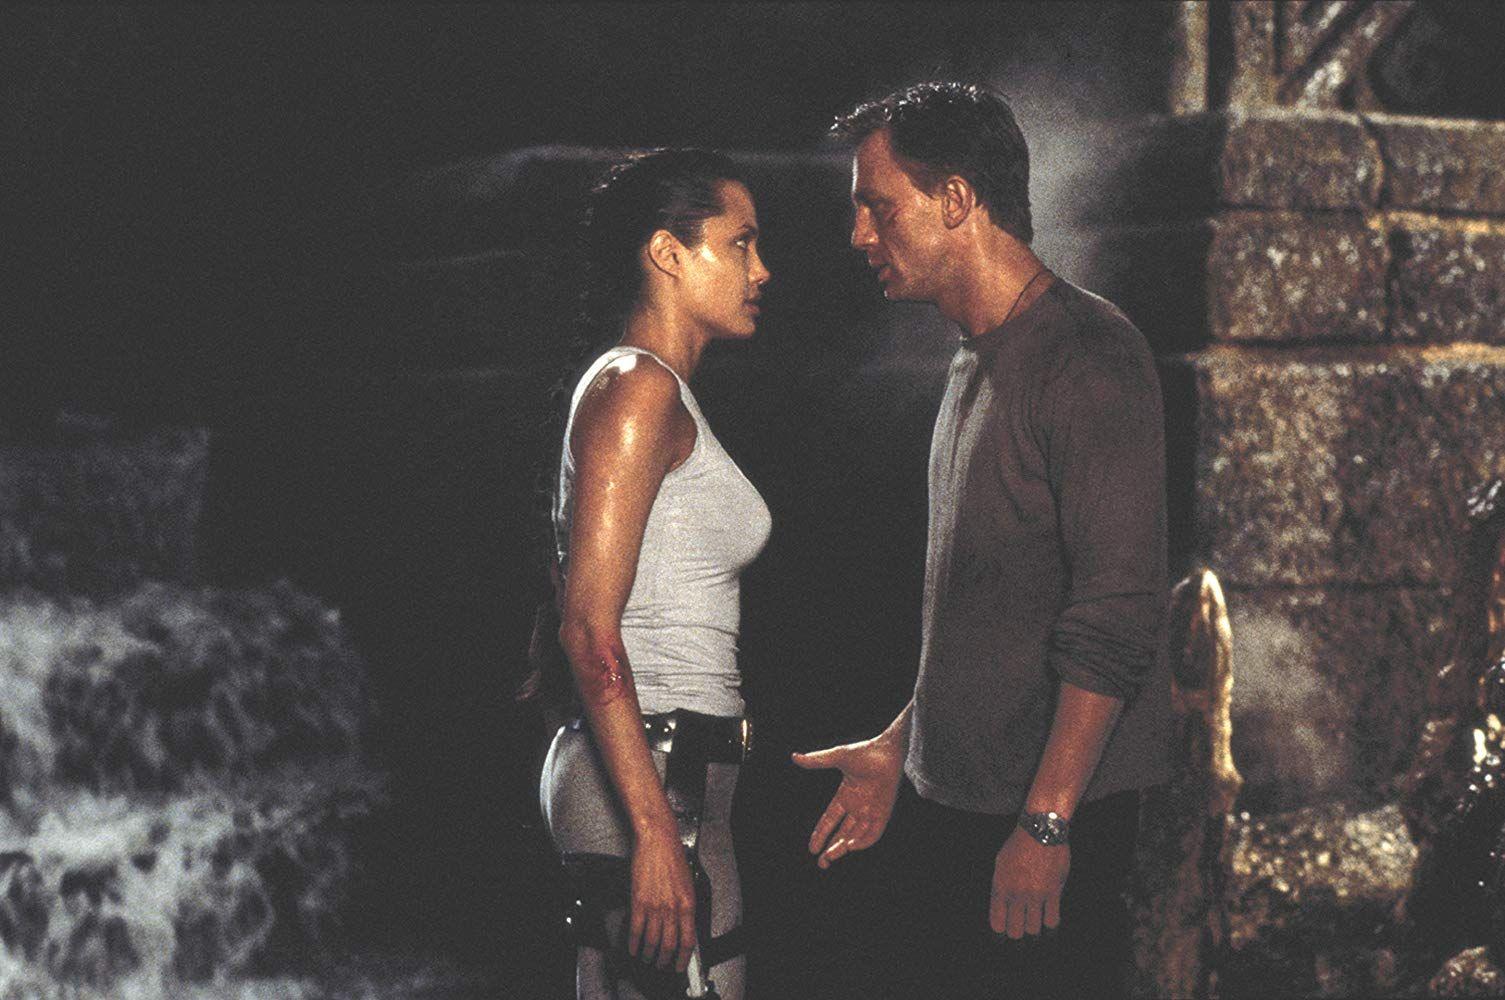 Angelina Jolie And Daniel Craig In Lara Croft Tomb Raider 2001 Daniel Craig Tomb Raider Tomb Raider Angelina Jolie Lara Croft